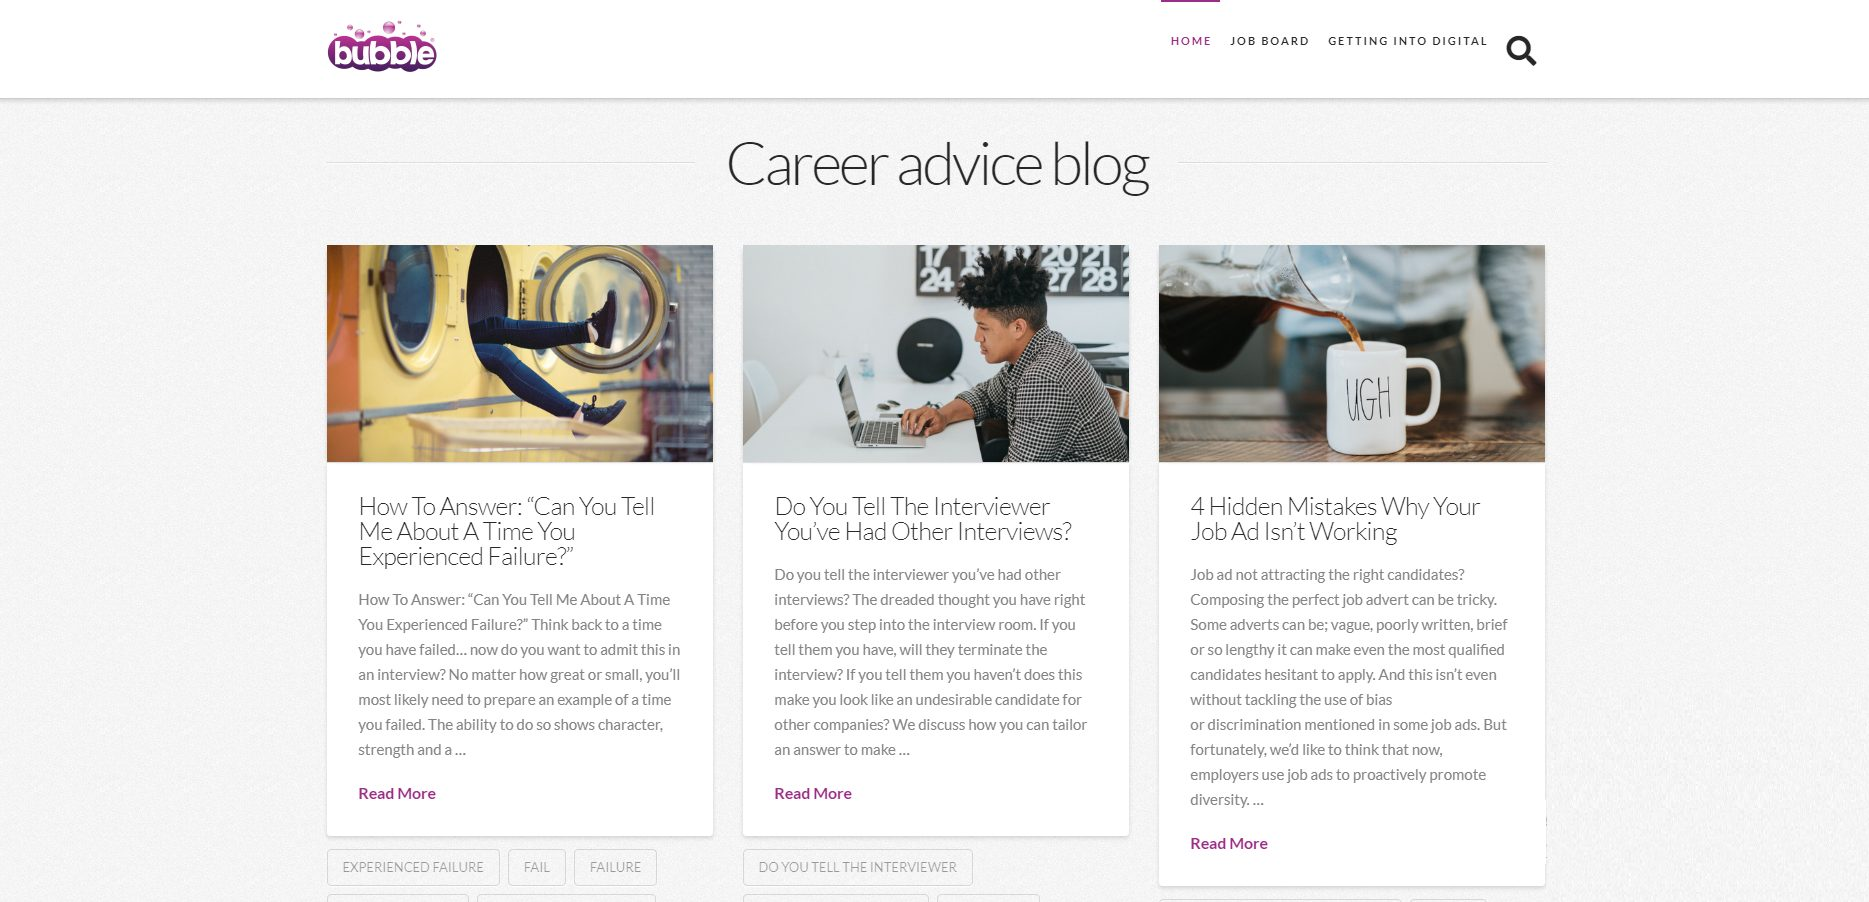 job search advice bubble blog